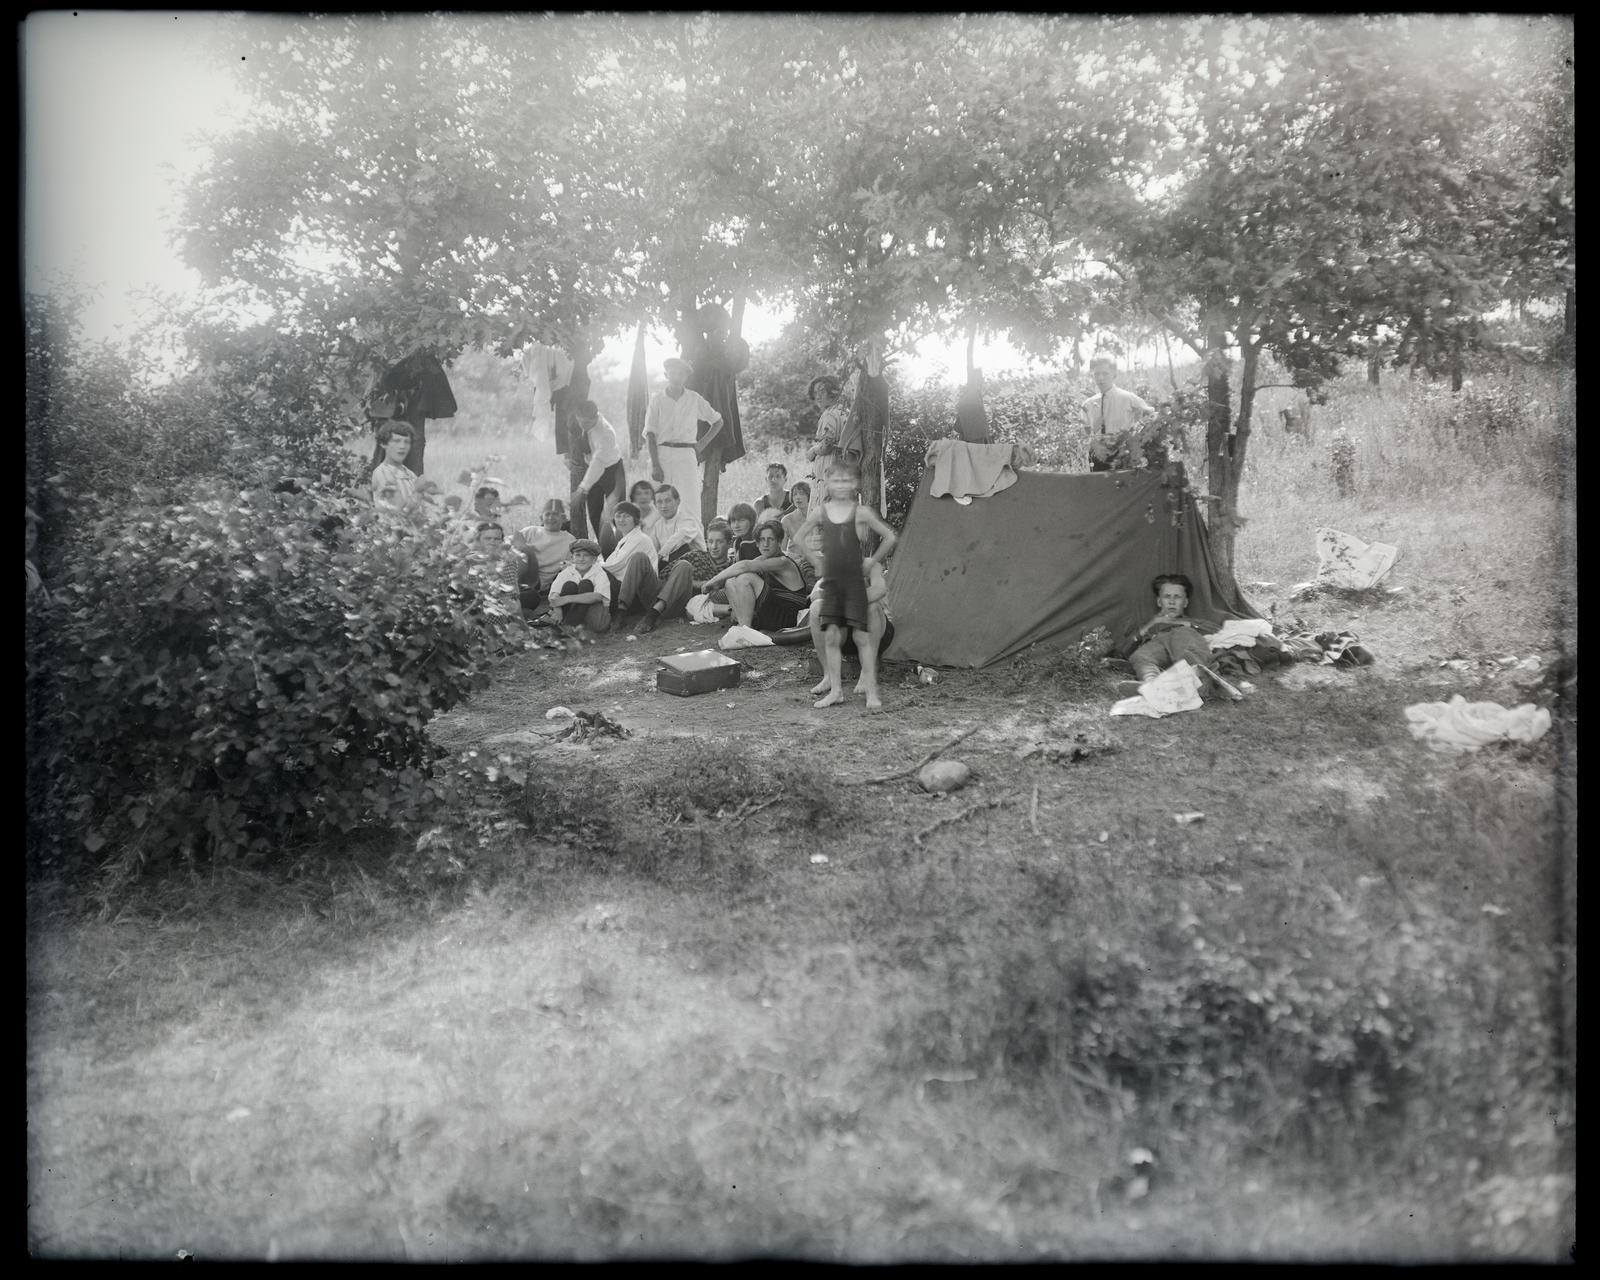 Activities, Camping